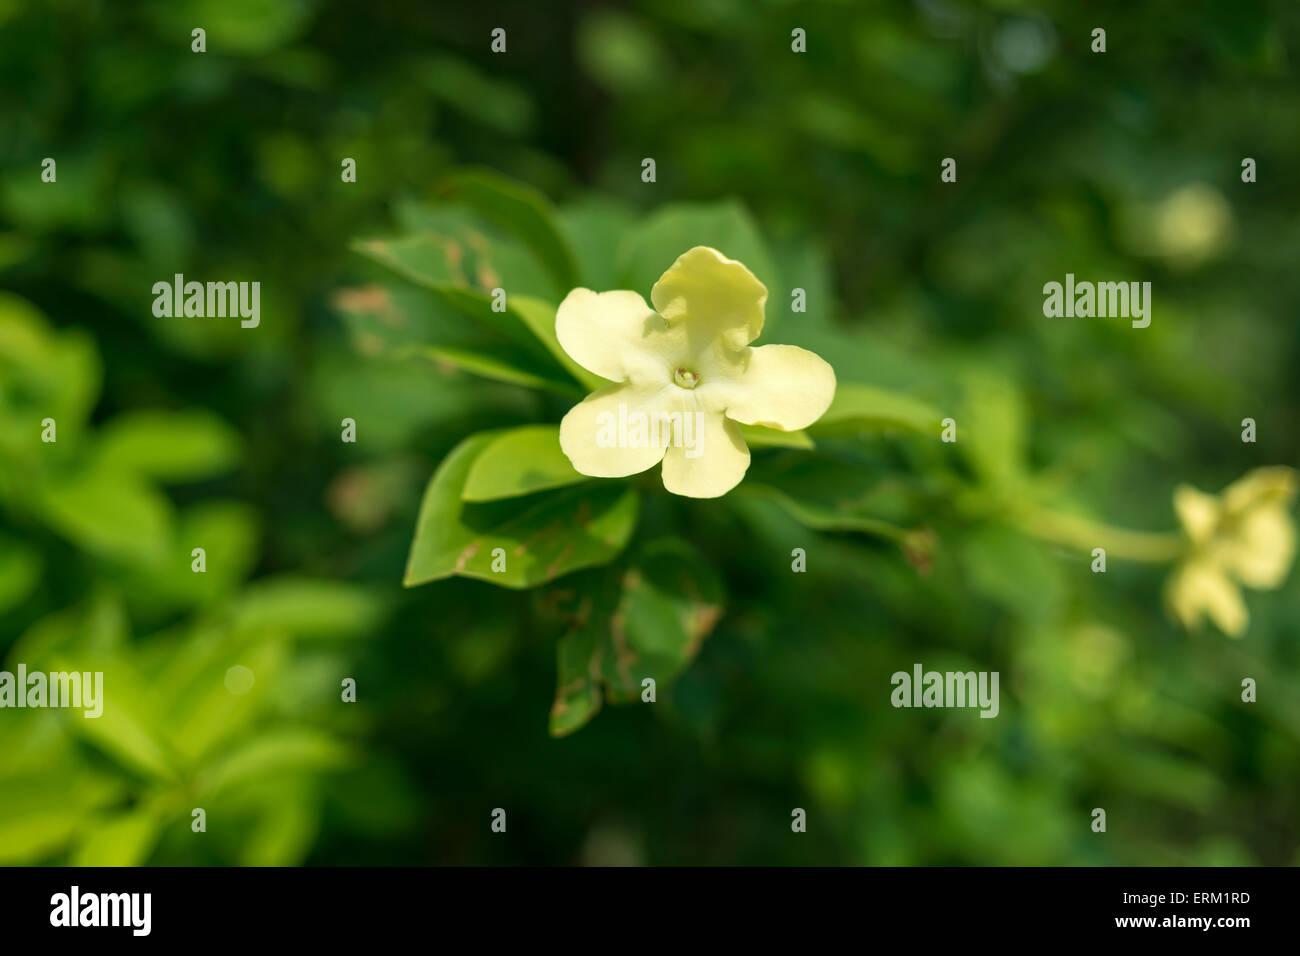 Night blooming jasmine plant with focus on flower stock photo night blooming jasmine plant with focus on flower izmirmasajfo